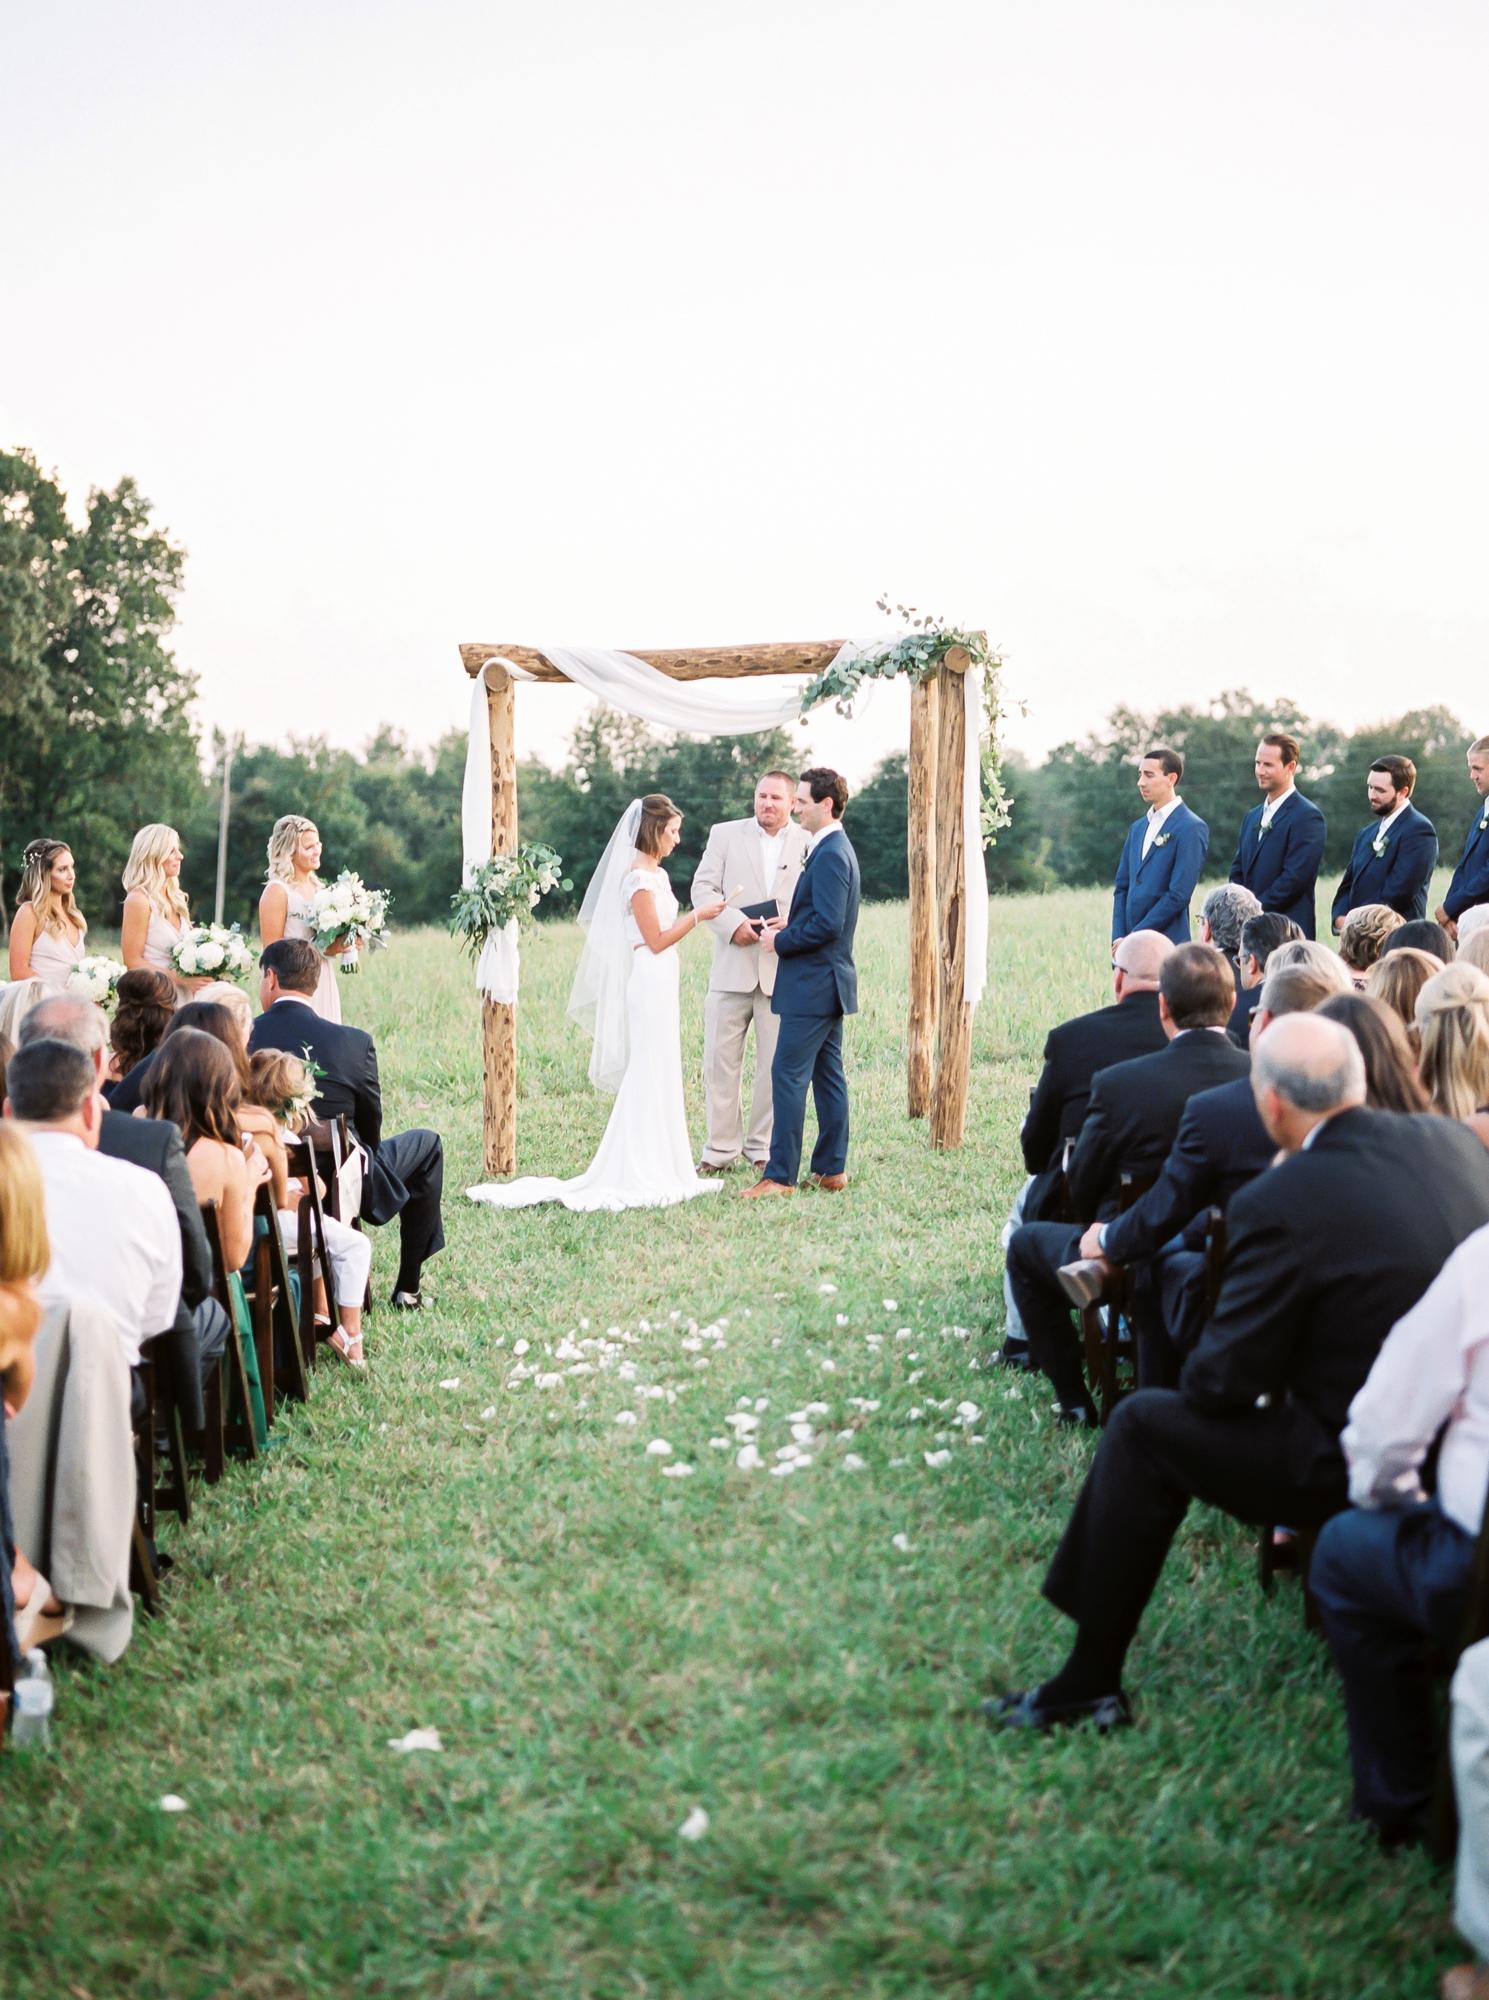 reading vows in ceremony idea